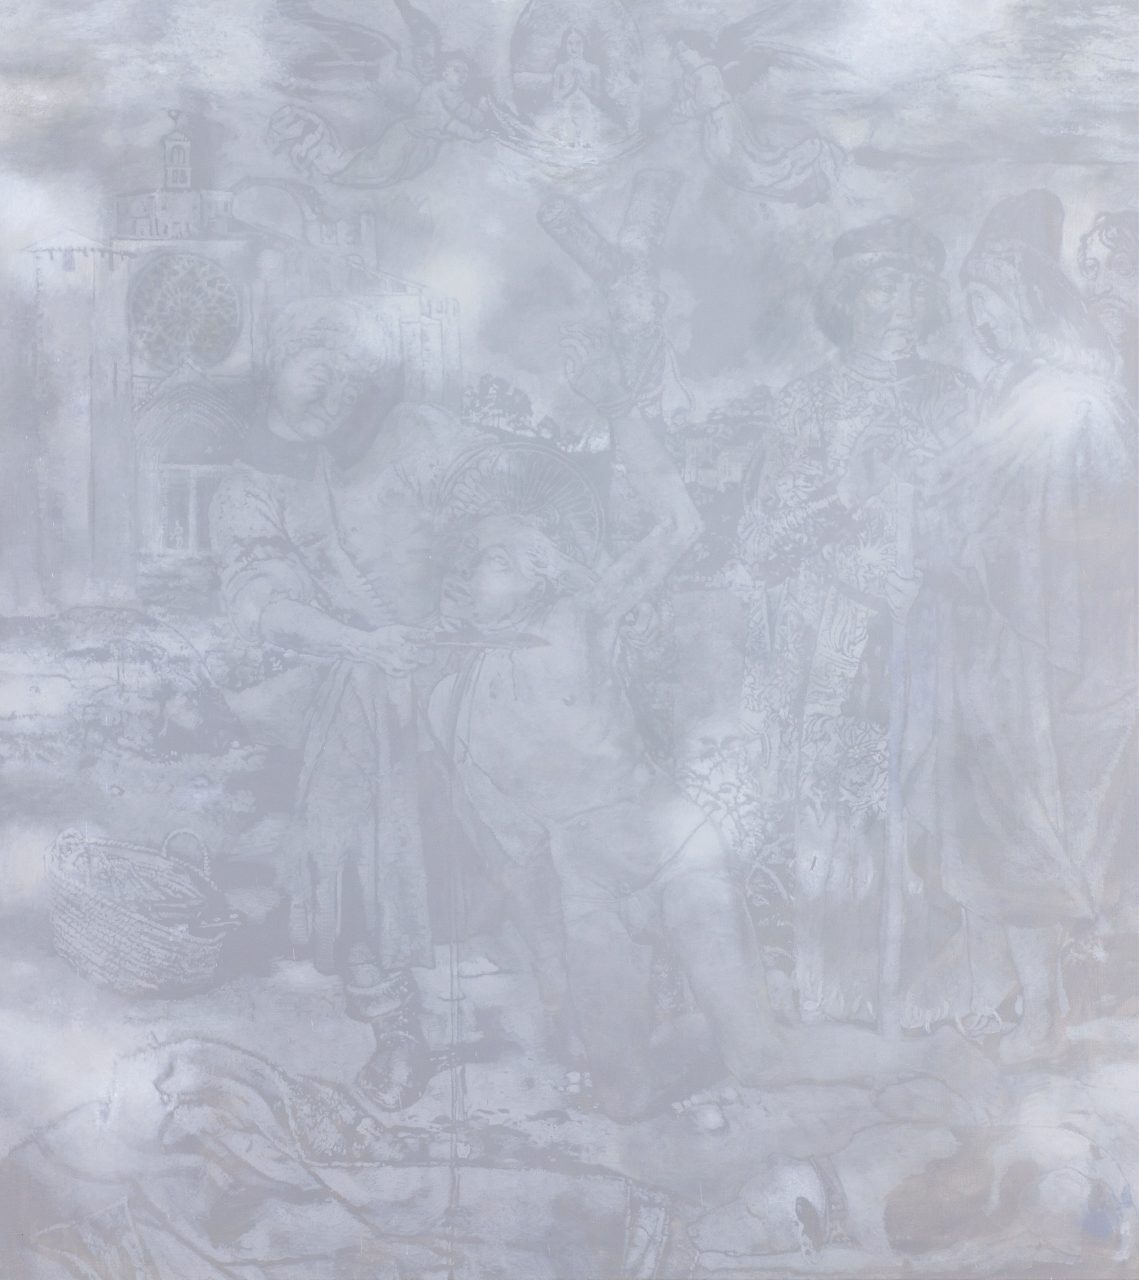 """silver surfer"", 2016, acrylic on canvas, 190 x 170 cm"